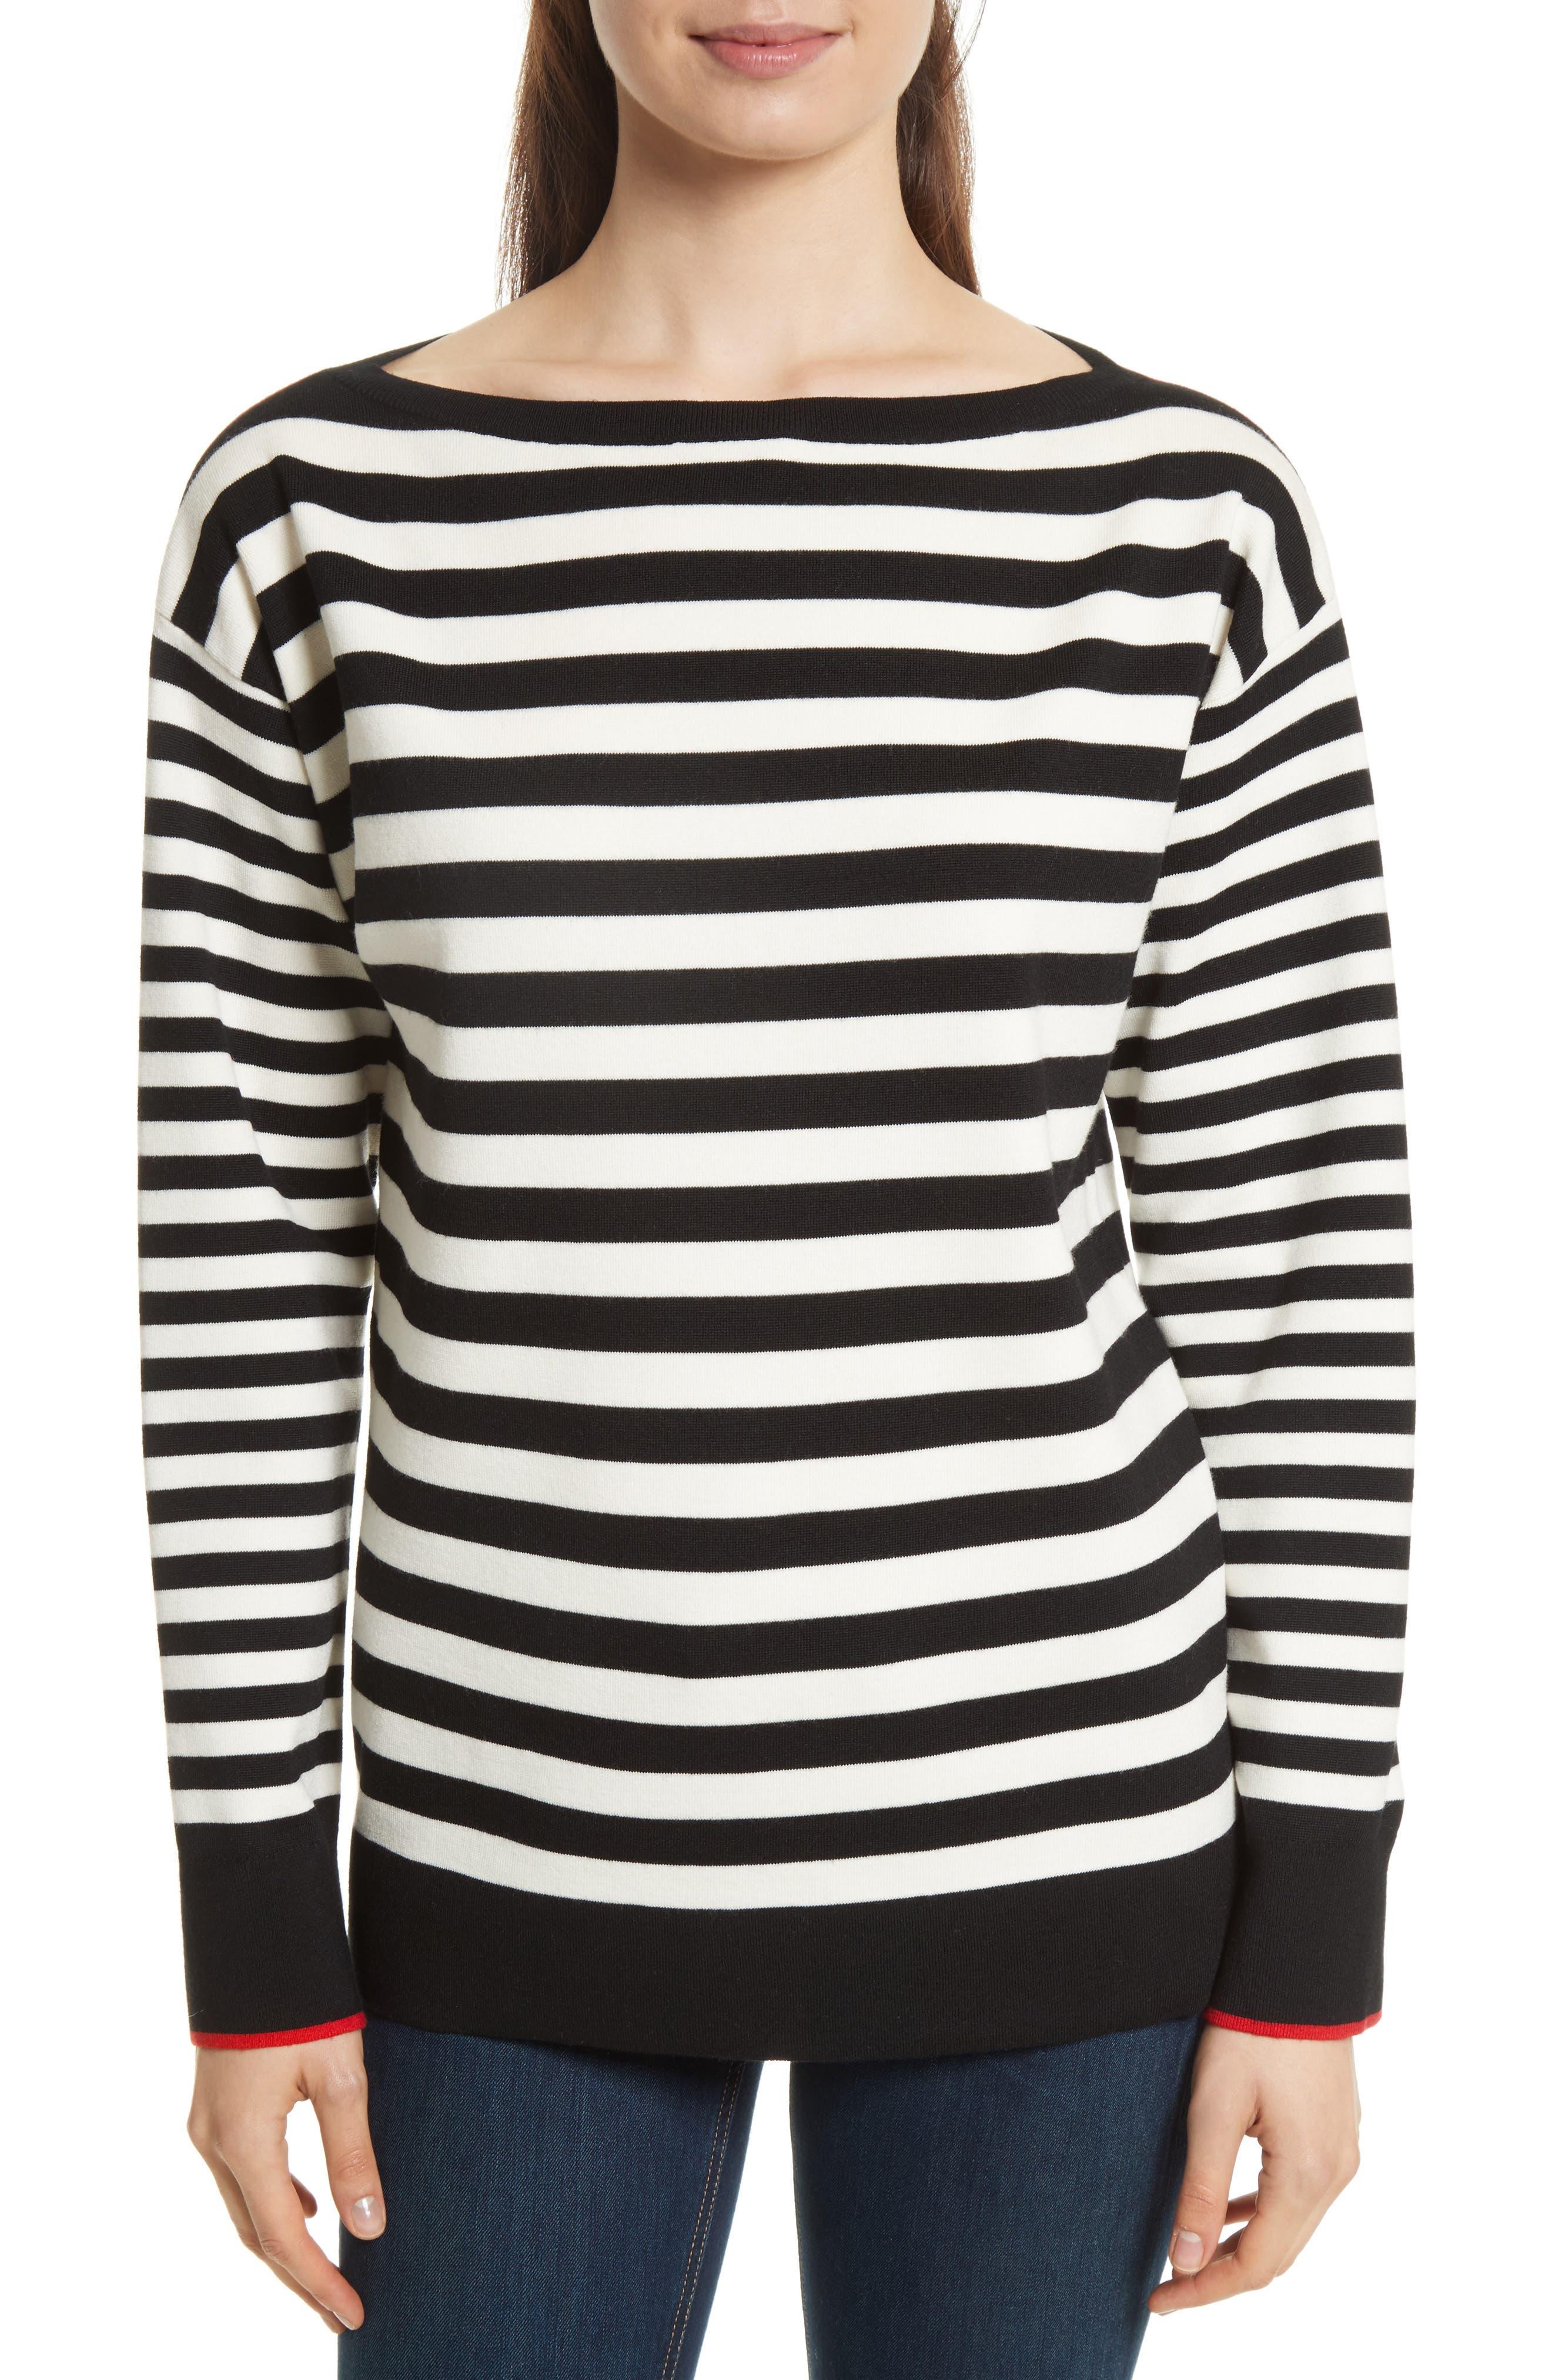 GREY JASON WU Stripe Off the Shoulder Knit Sweater